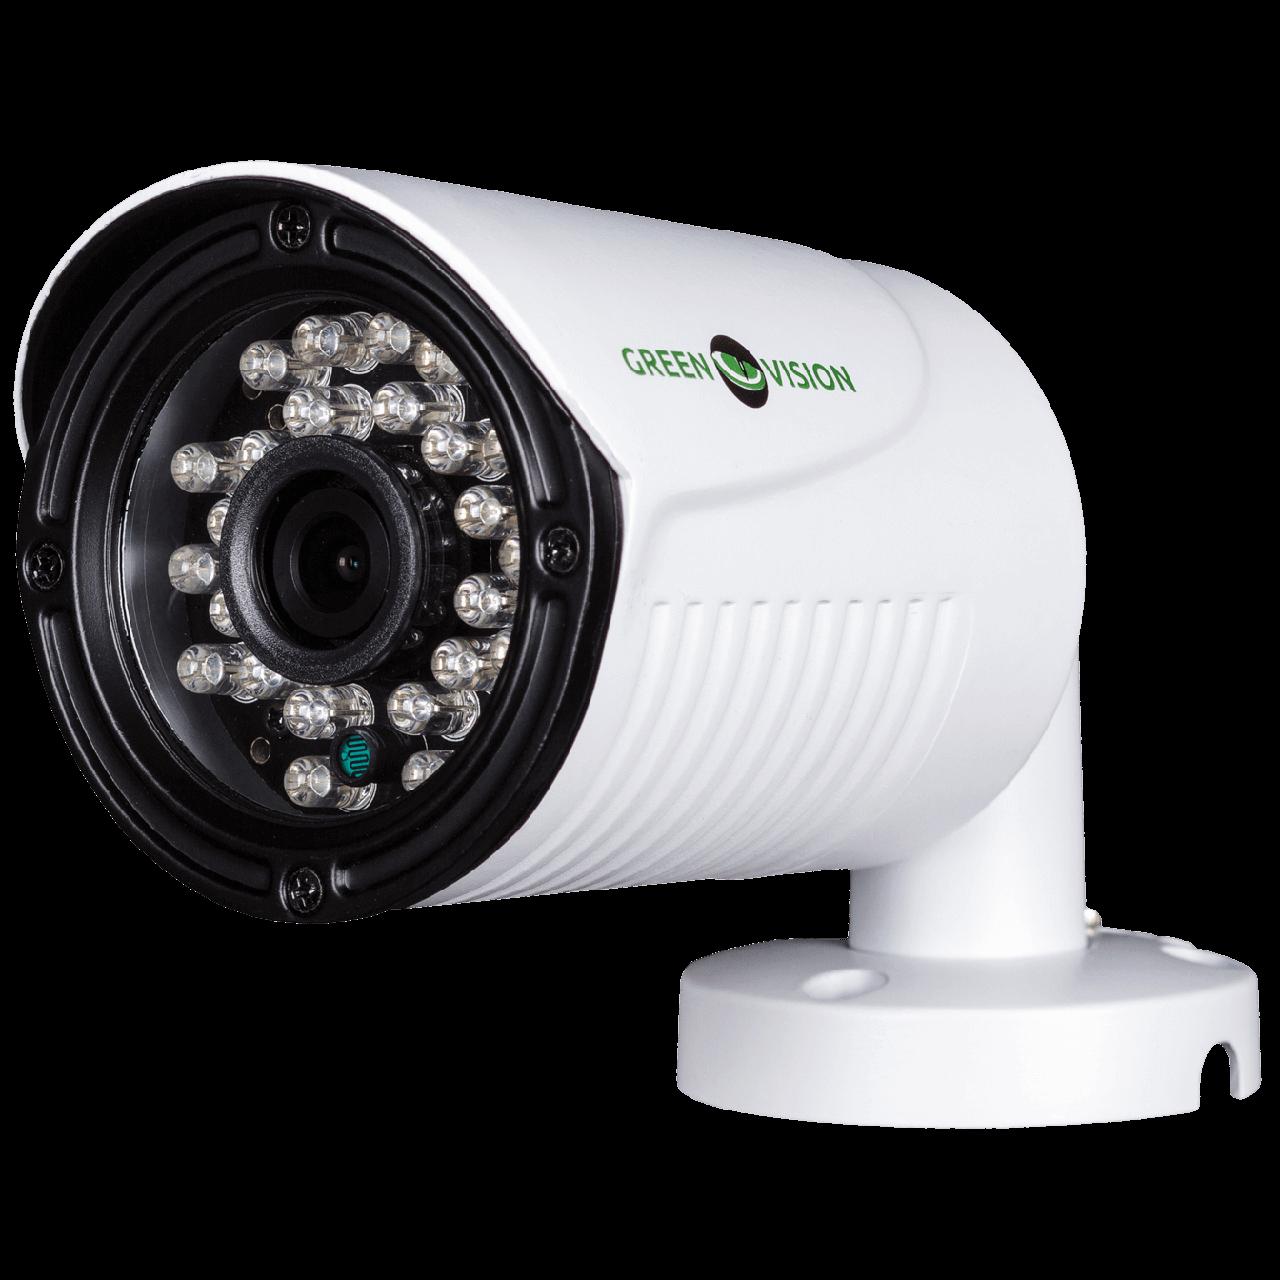 Камера наружная AHD Green Vision GV-045-AHD-G-COO10-20 720Р